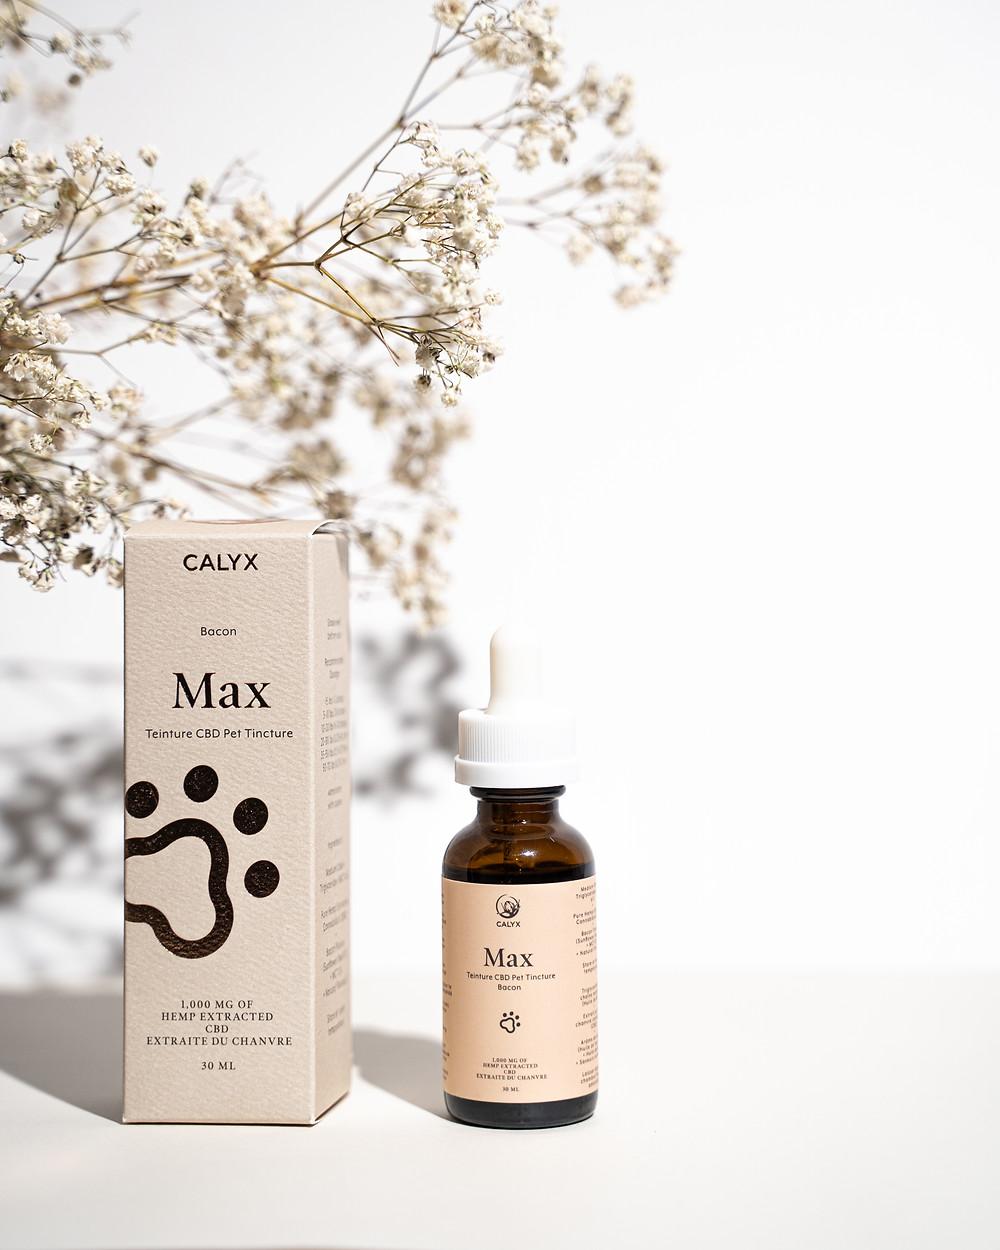 Calyx Wellness Max 1000mg CBD Oil